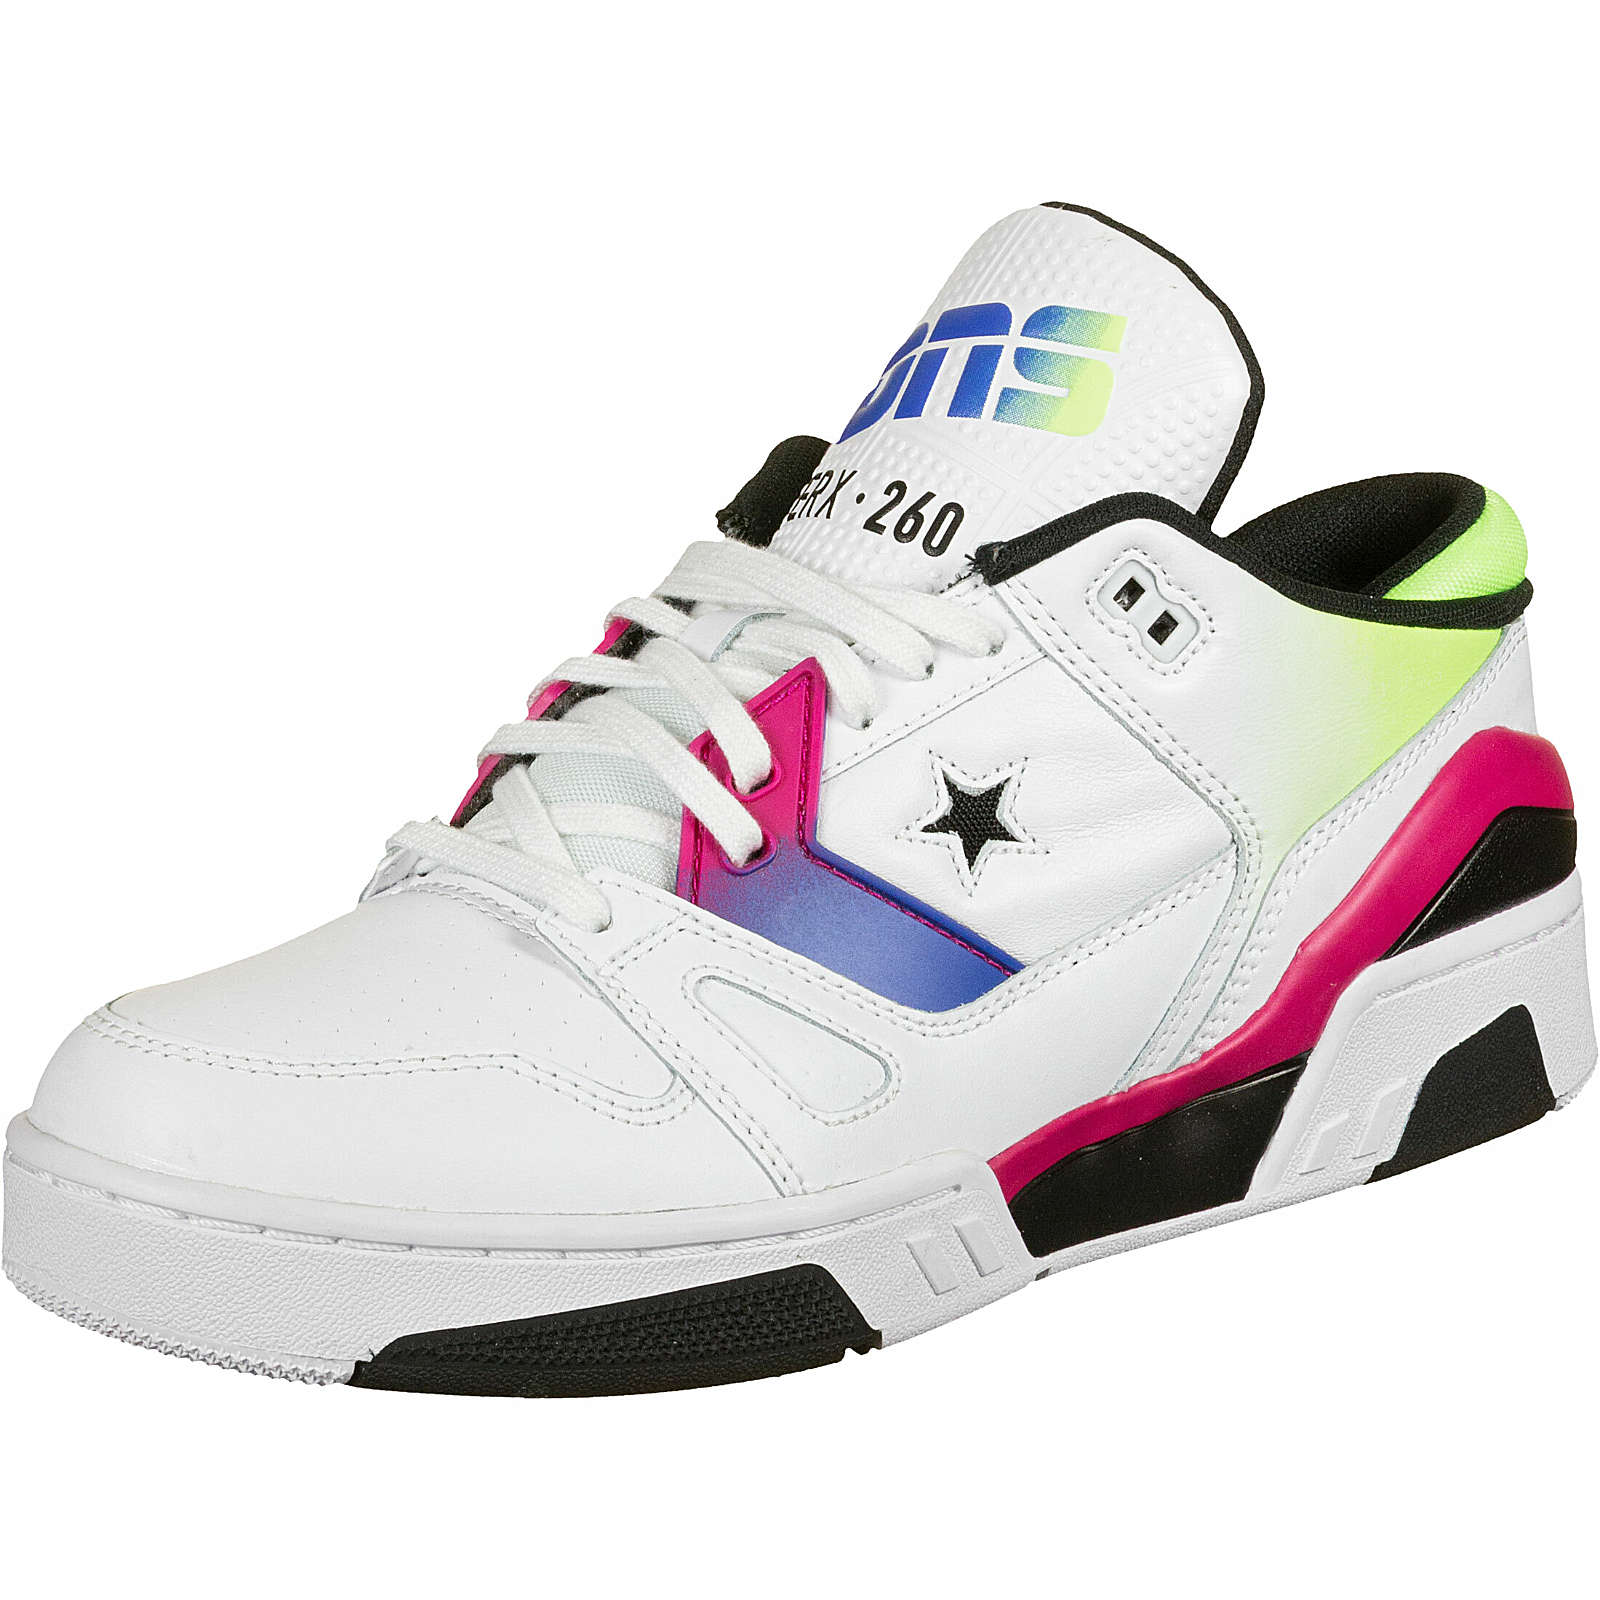 CONVERSE Schuhe ERX 260 OX Sneakers Low weiß Herren Gr. 42,5